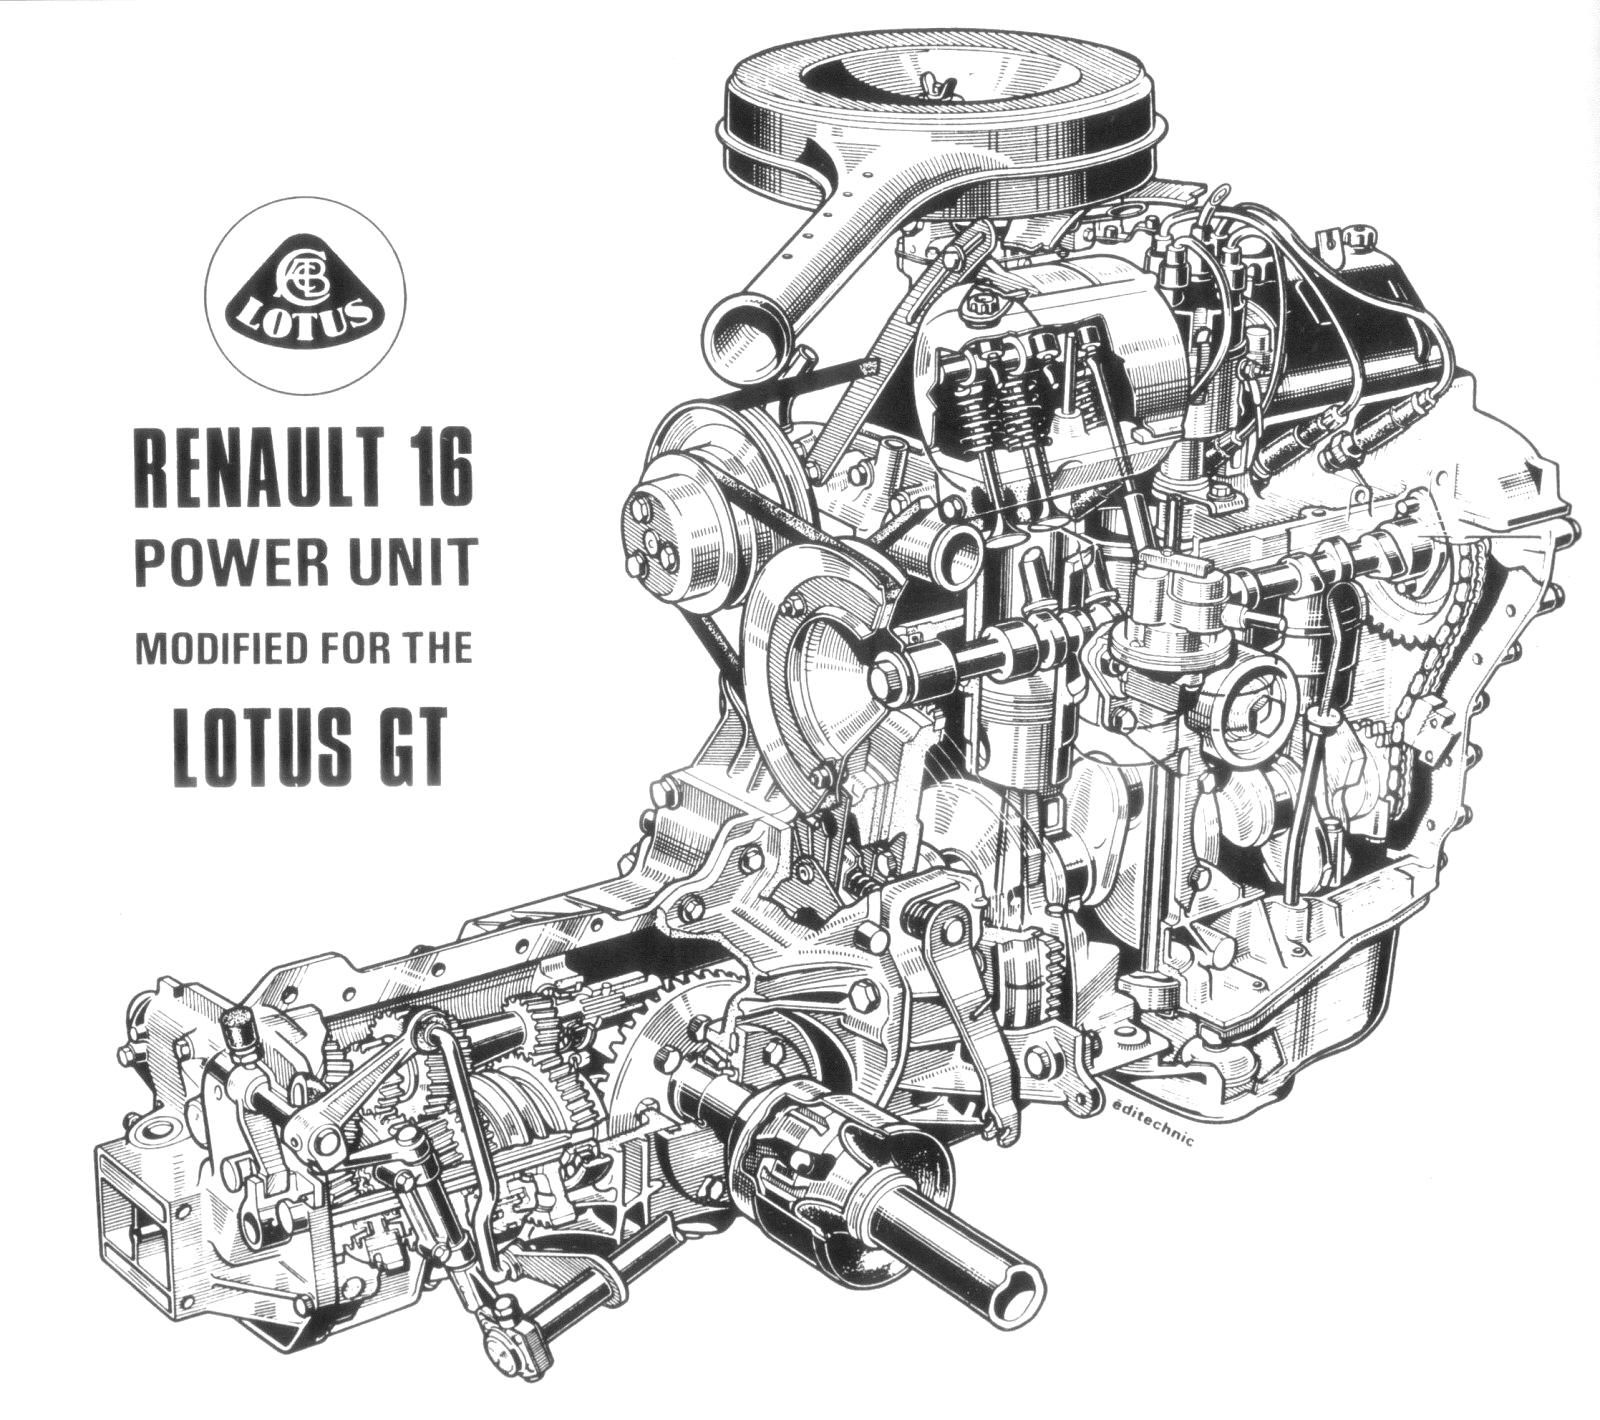 Lotus Renault Engine Europa Pinterest Engineering Cars Cooling Diagram